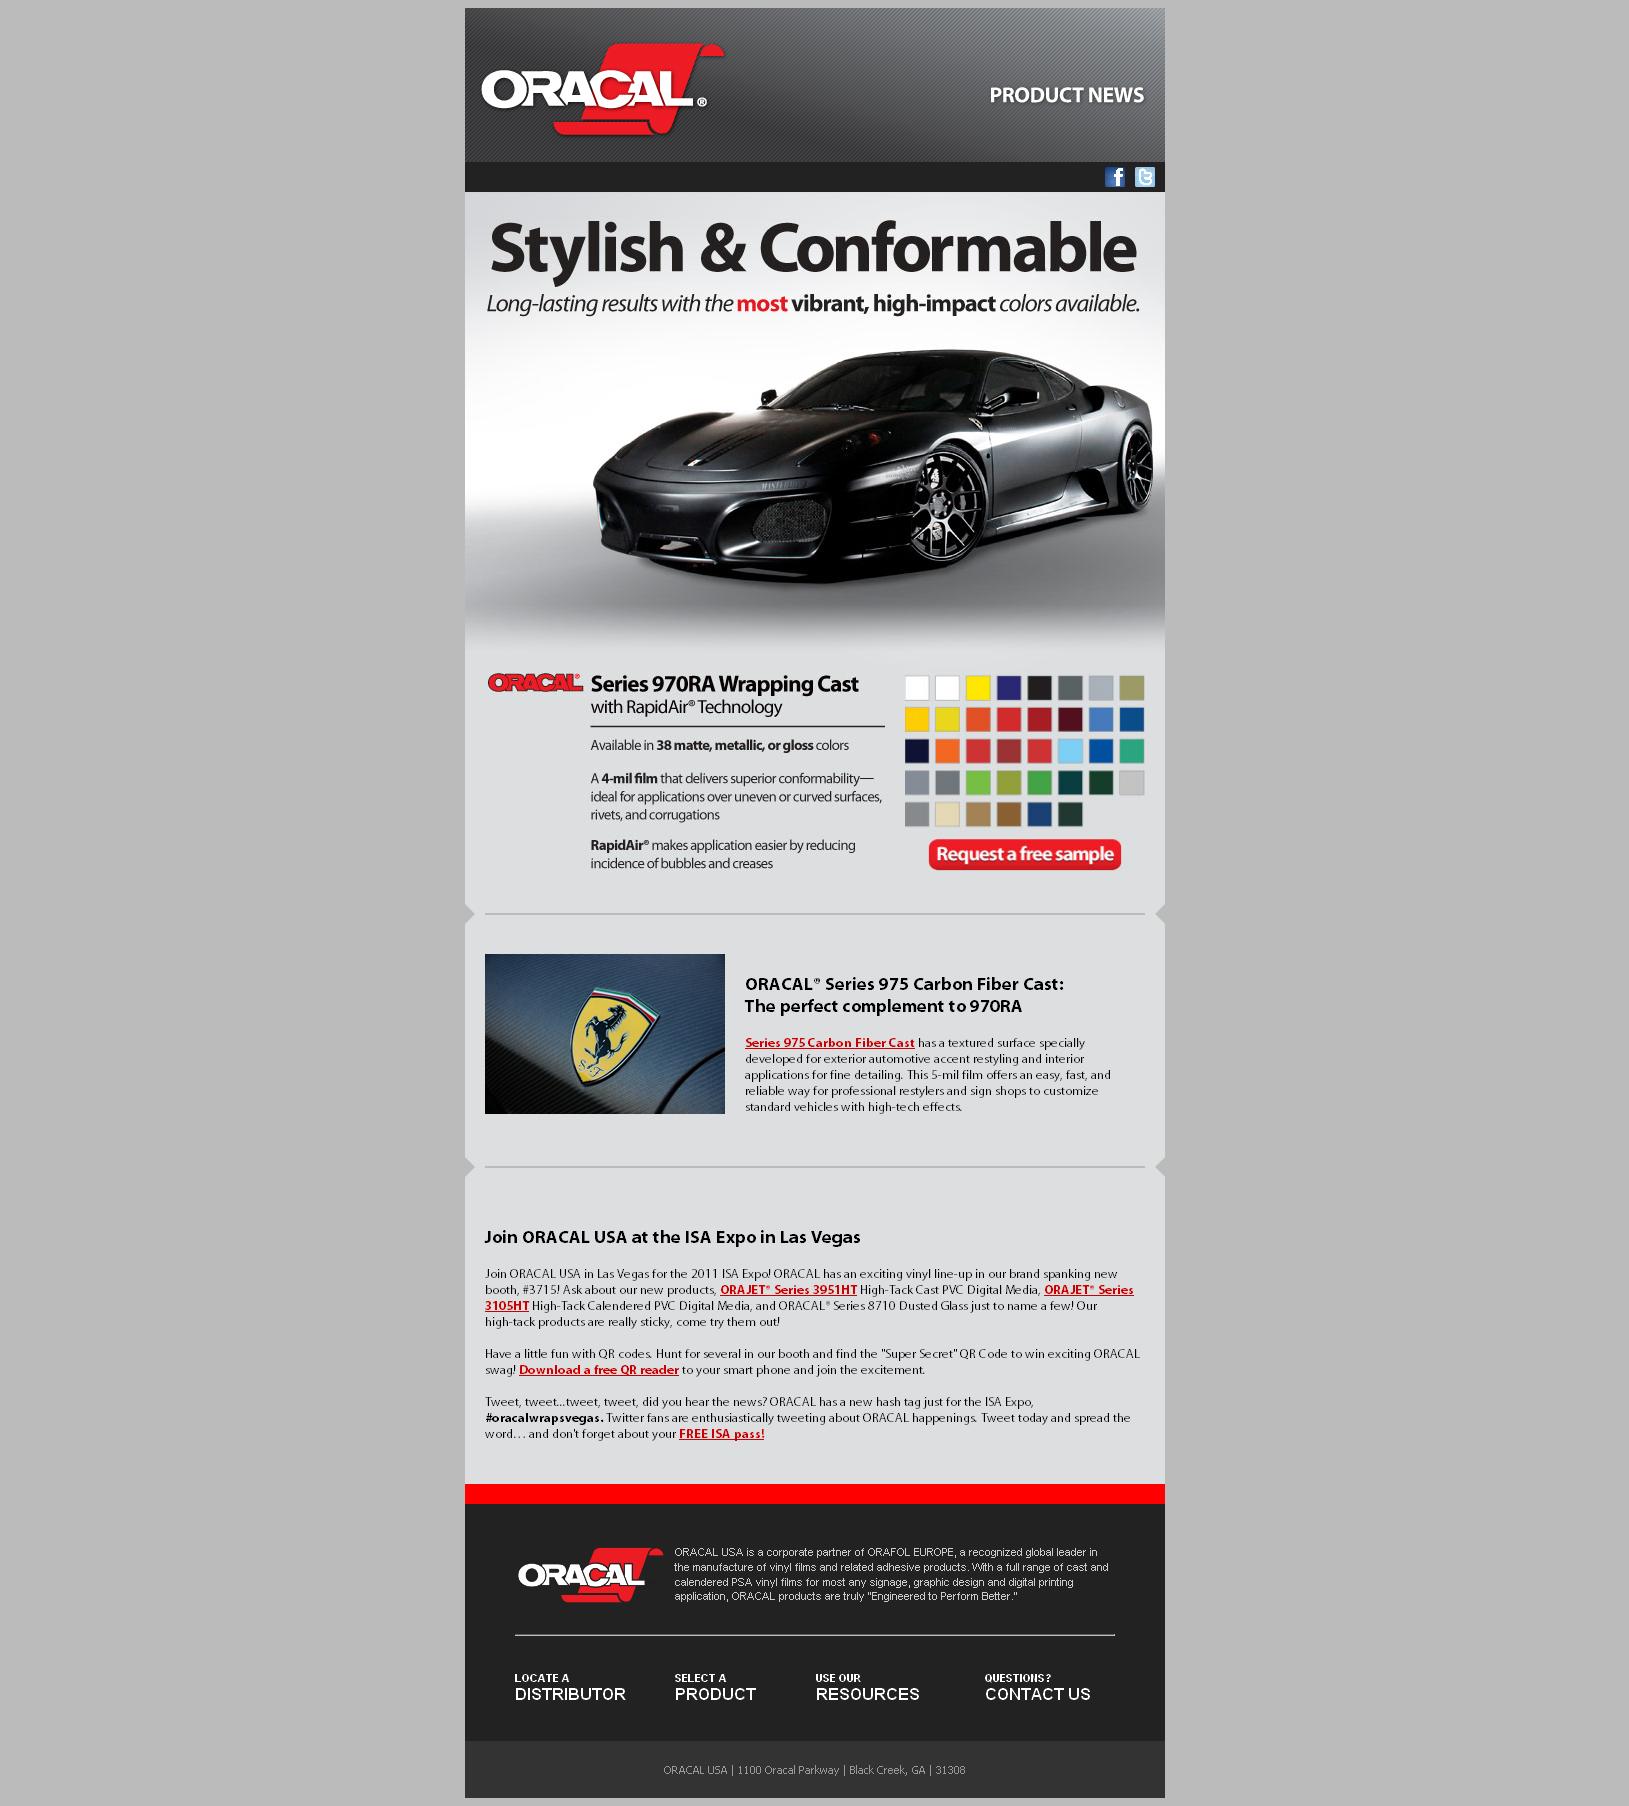 Complete mailchimp email newsletter | Email newsletter design